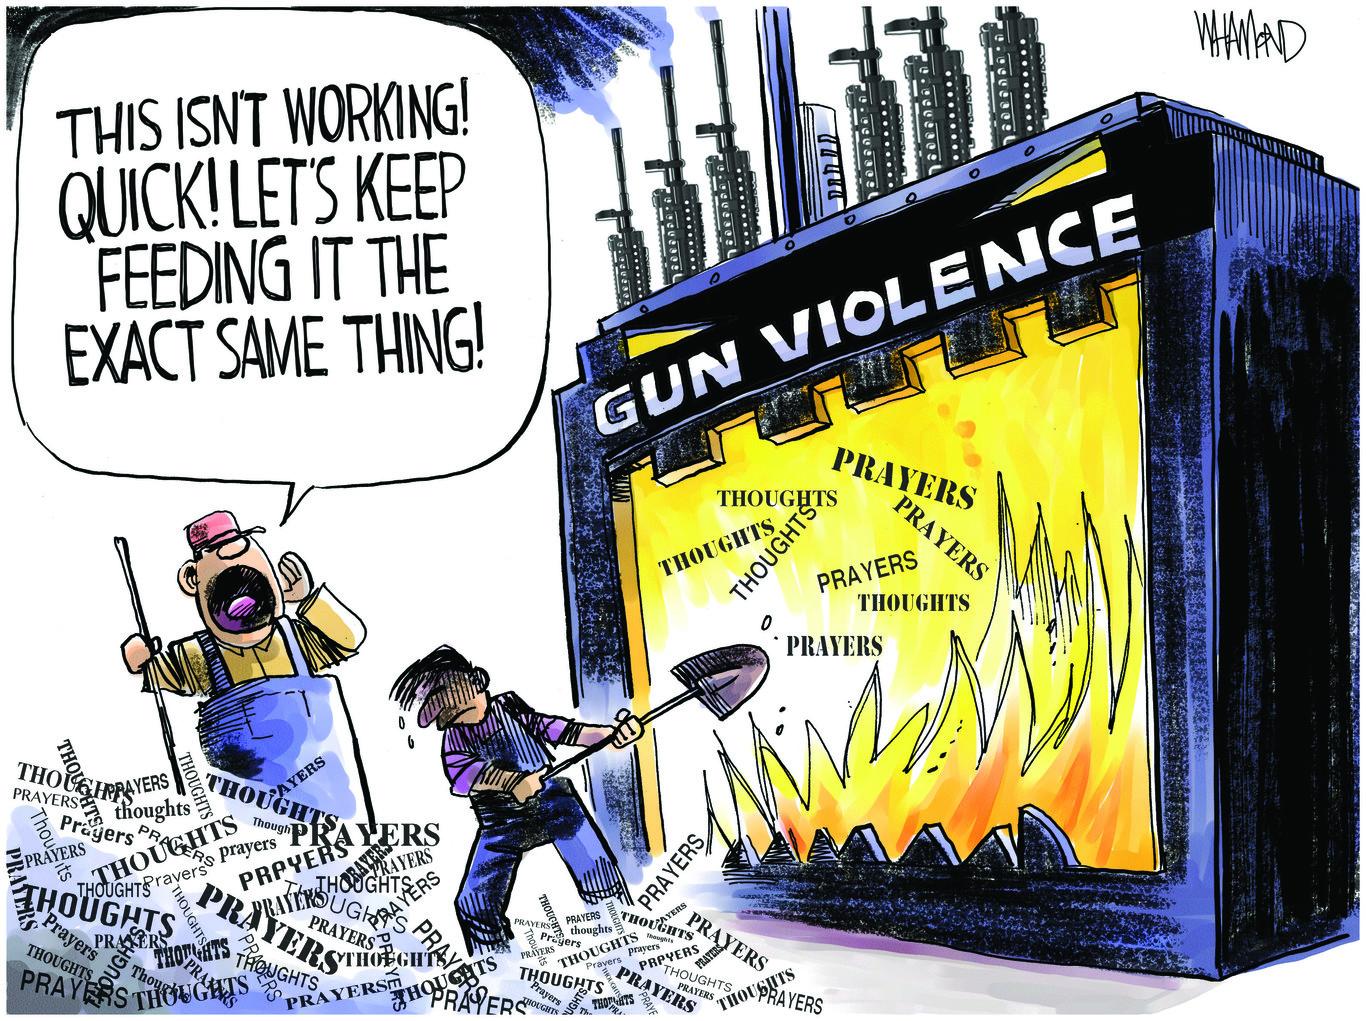 GUN CONTROL, REFORMS, GUN SAFETY, BACKGROUND CHECKS, NRA, MASS SHOOTING, SECOND AMENDMENT